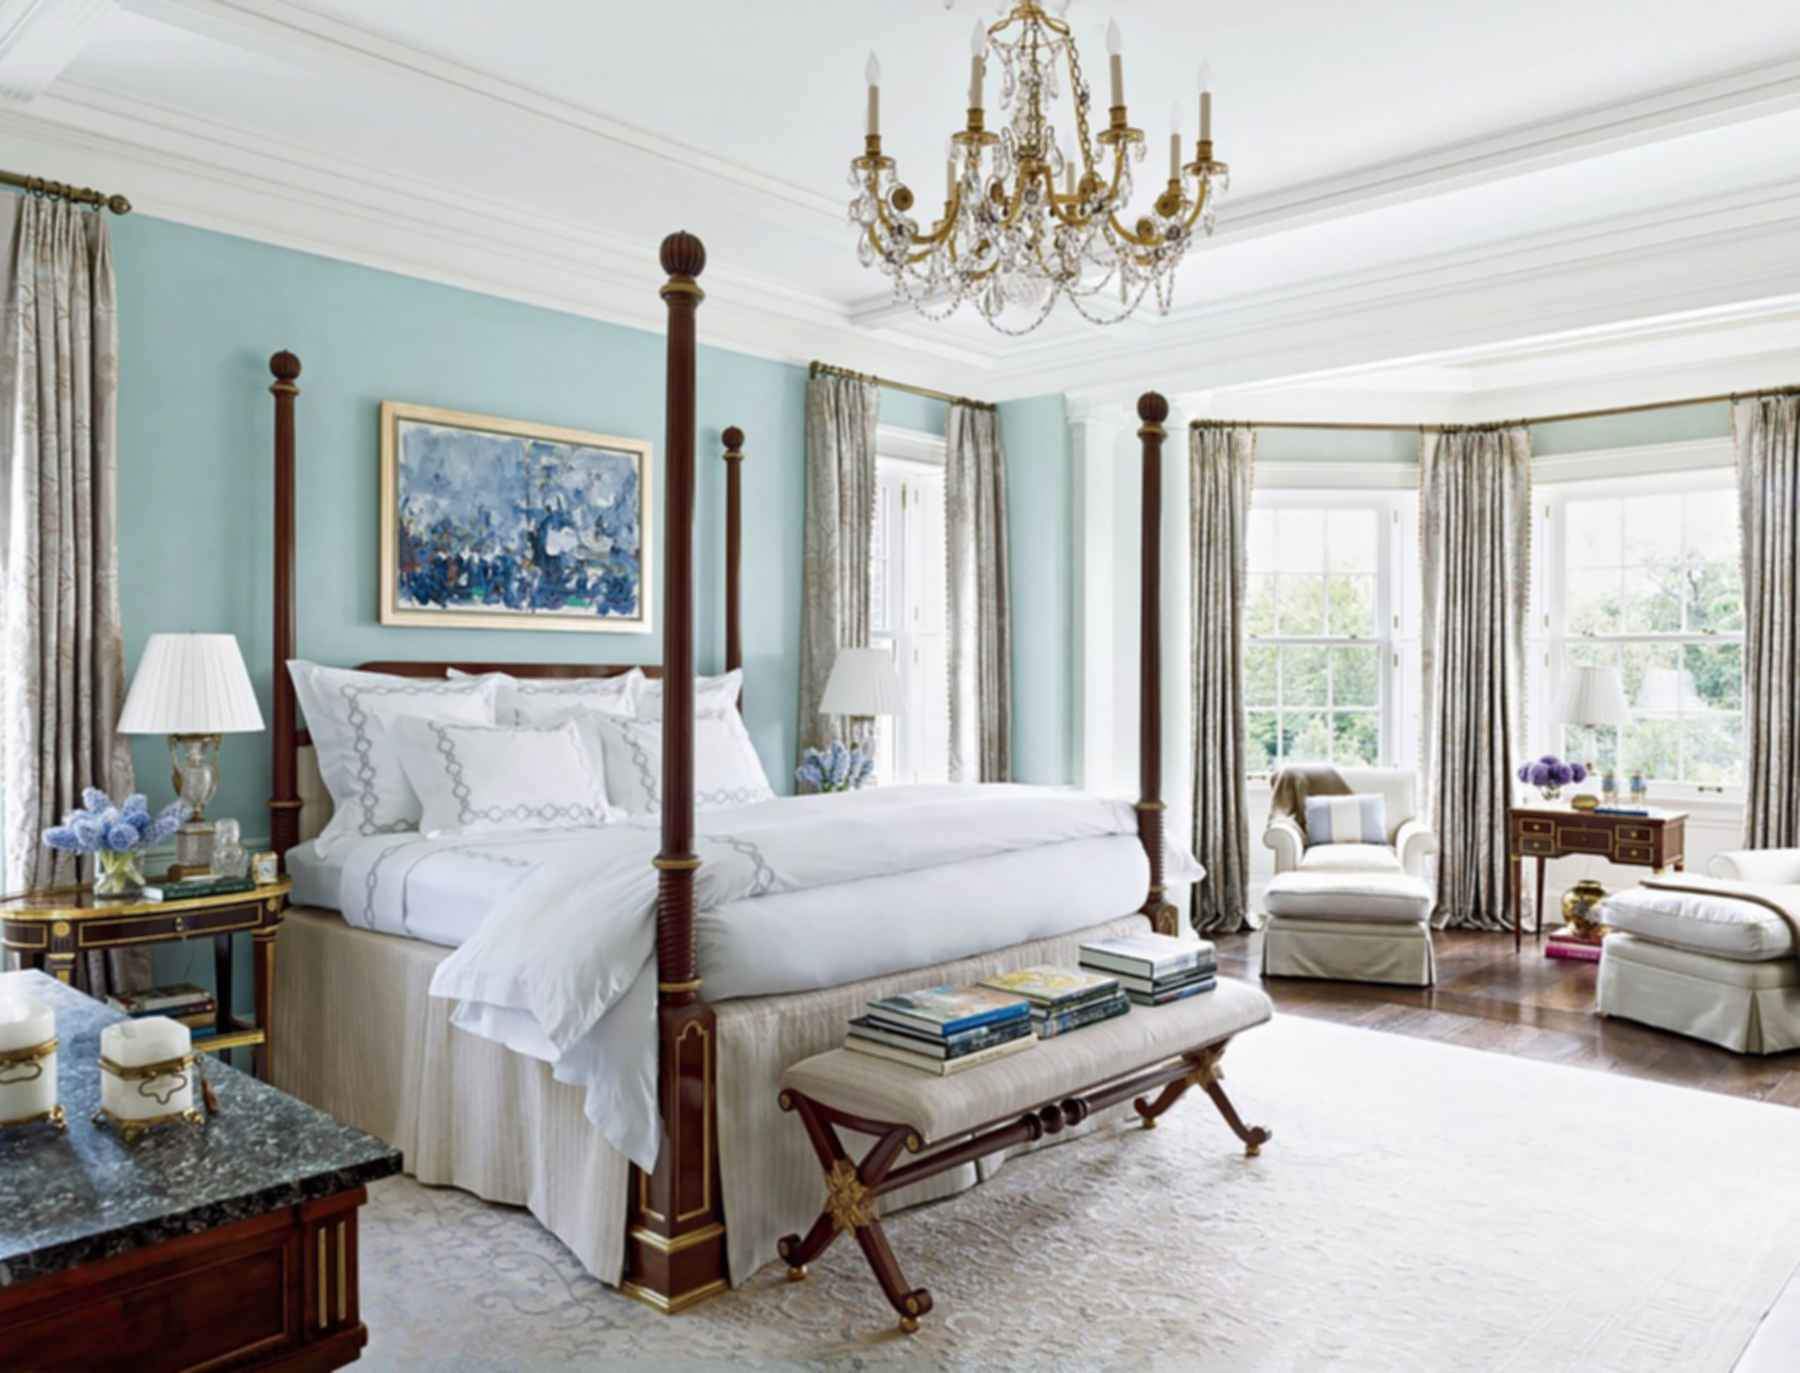 Texas Residence - Bedroom